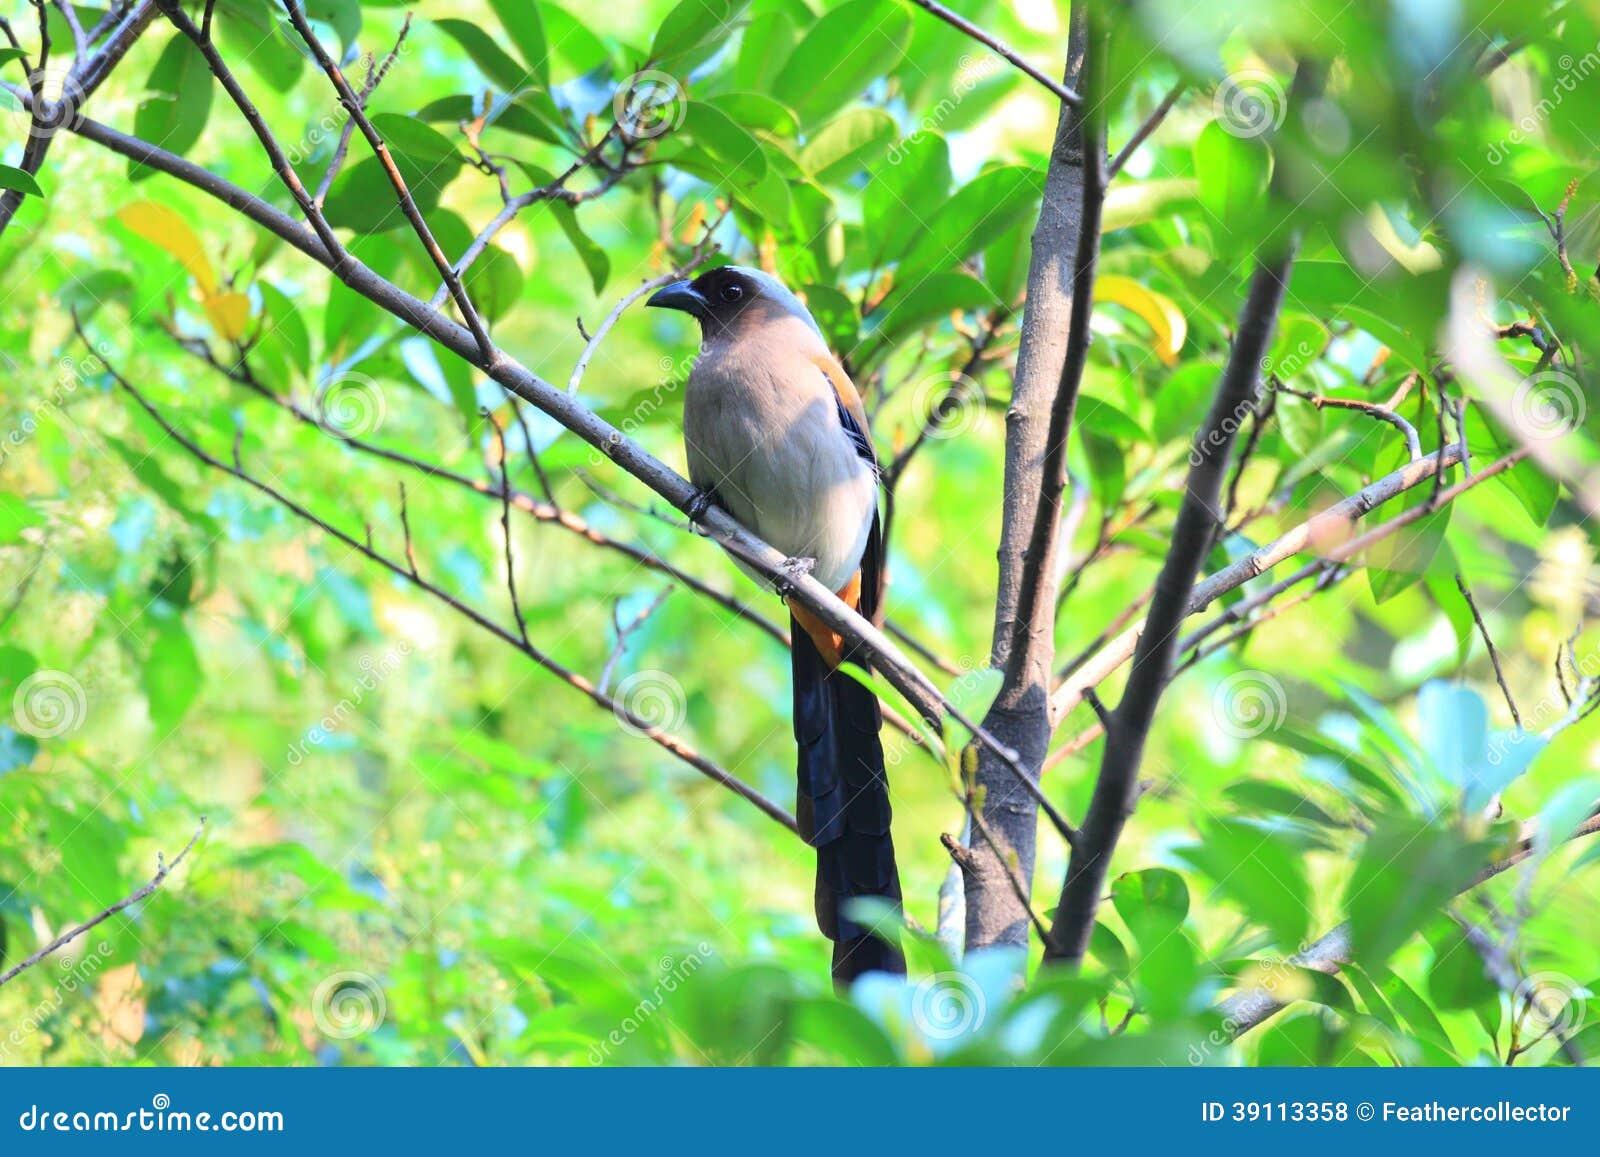 Grey Treepie of Himalayan Treepie